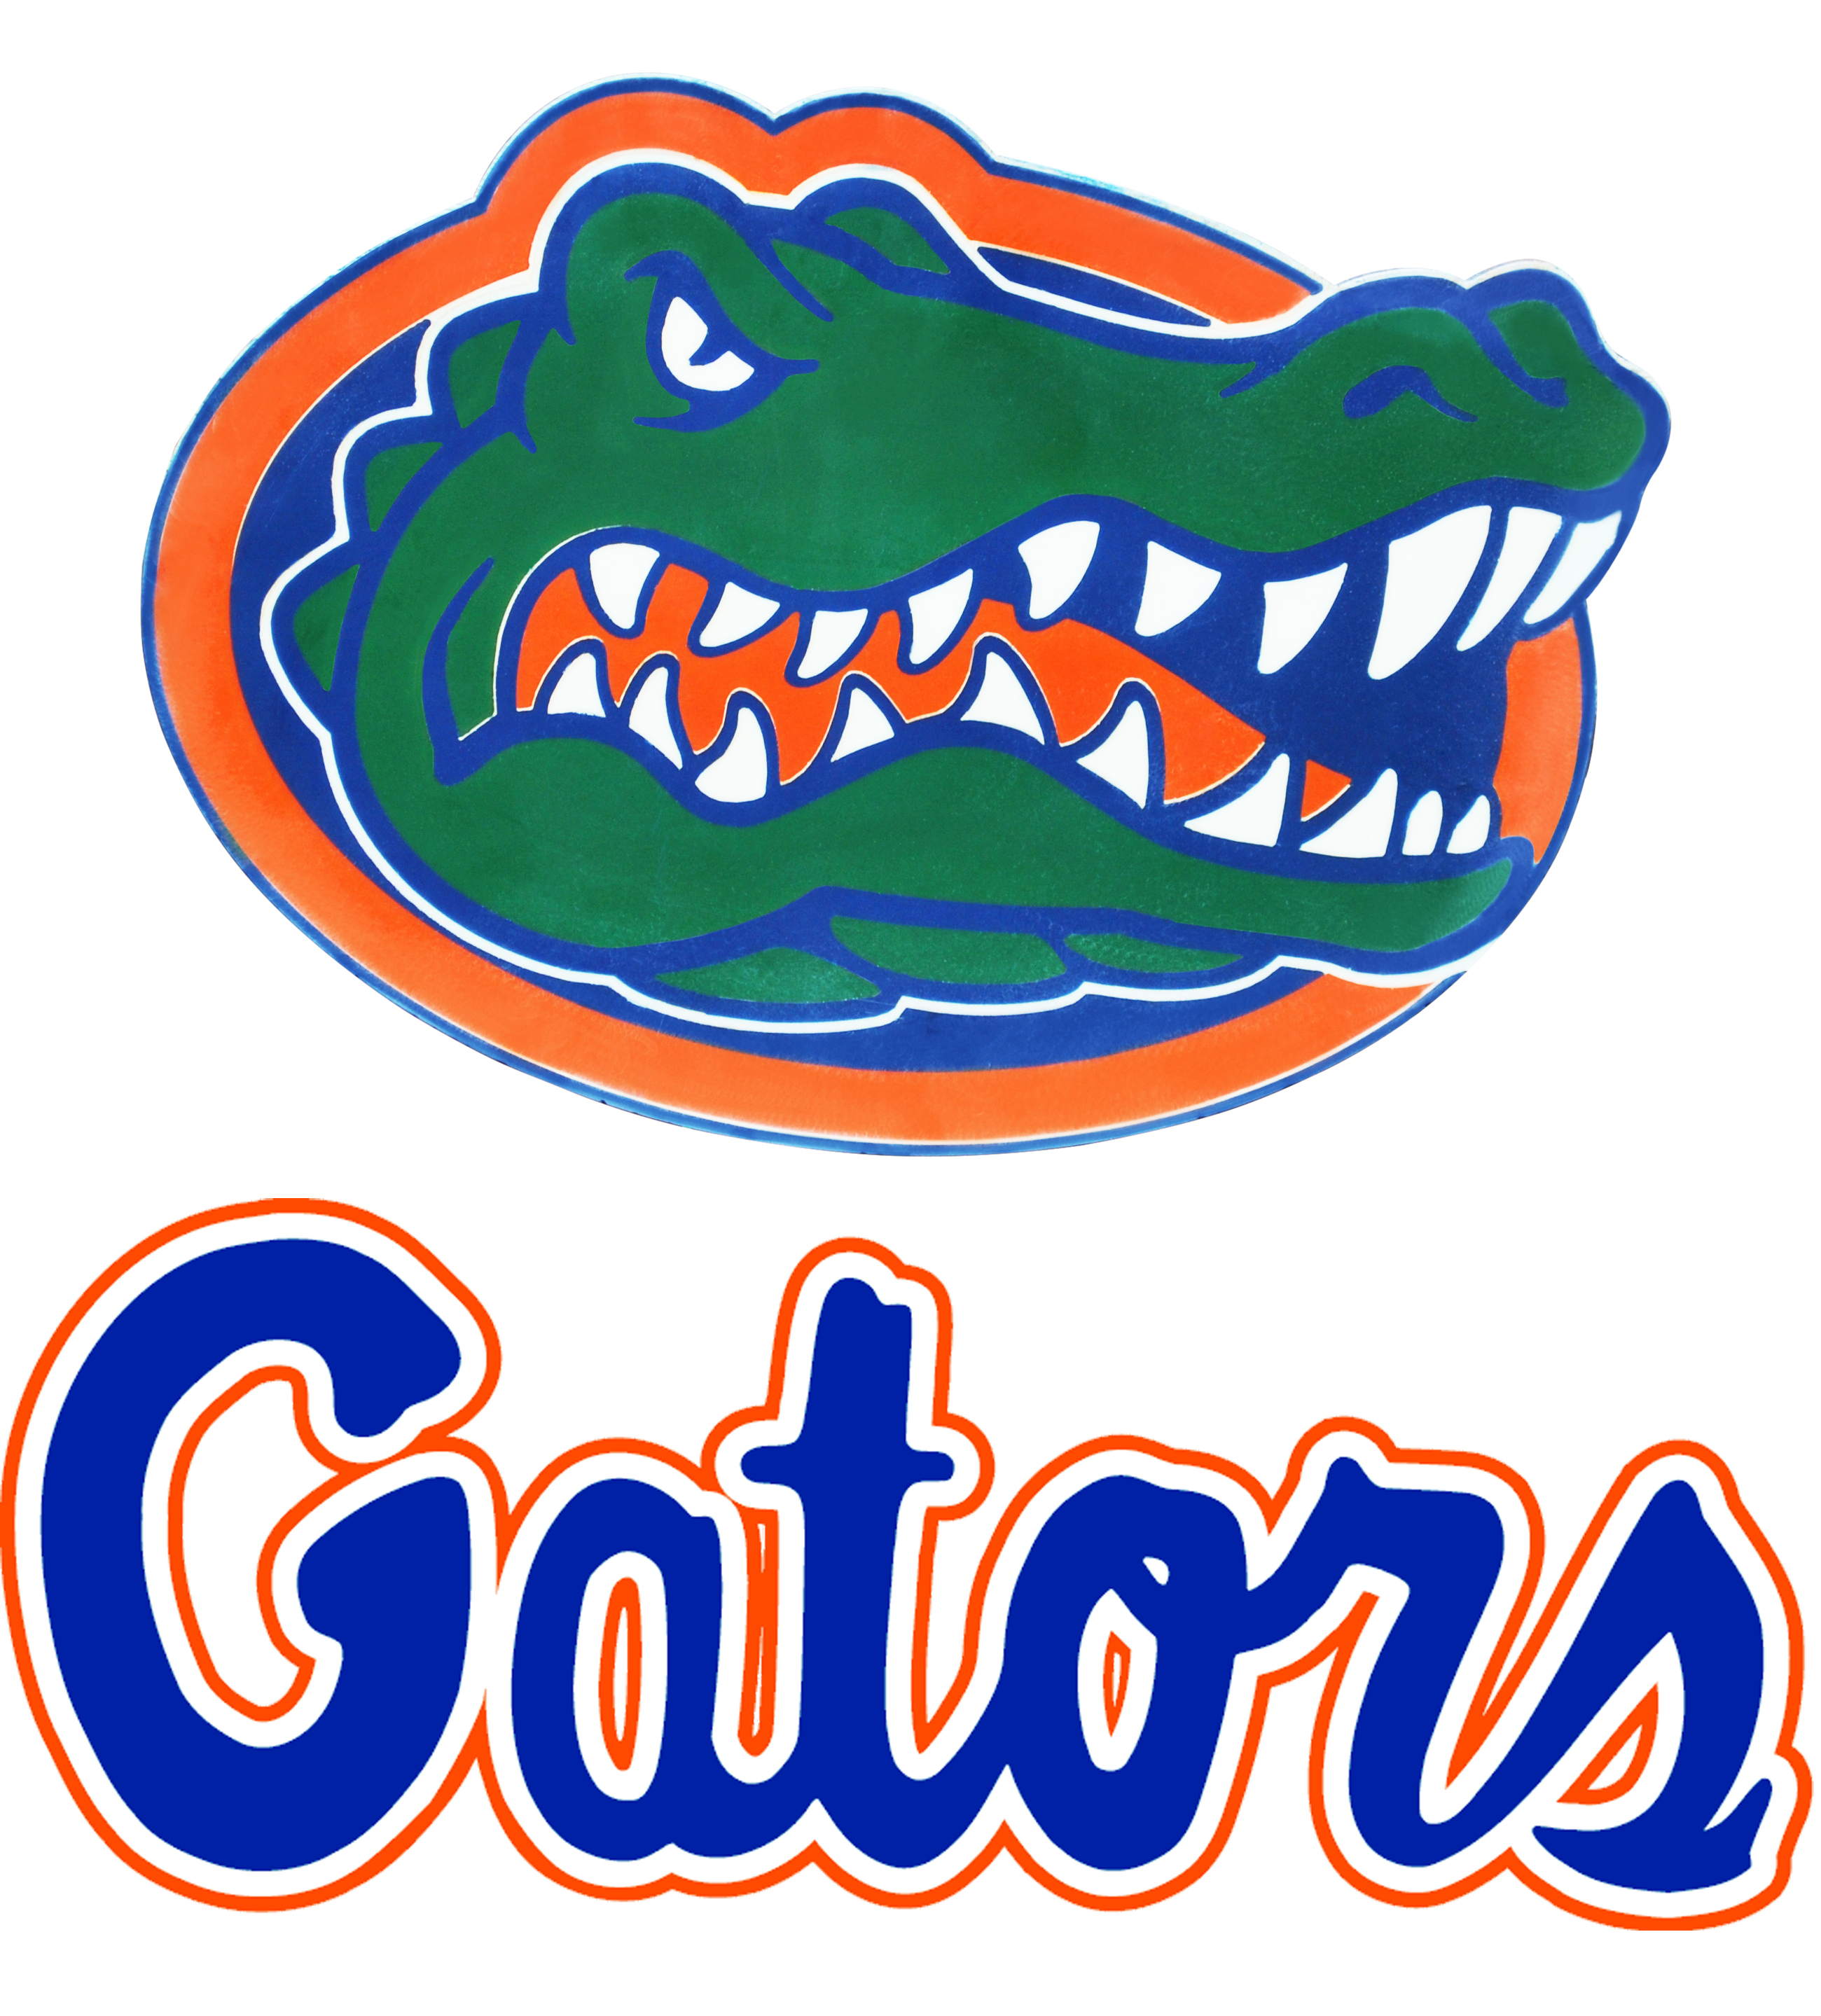 Meaning Florida Gators logo and symbol.